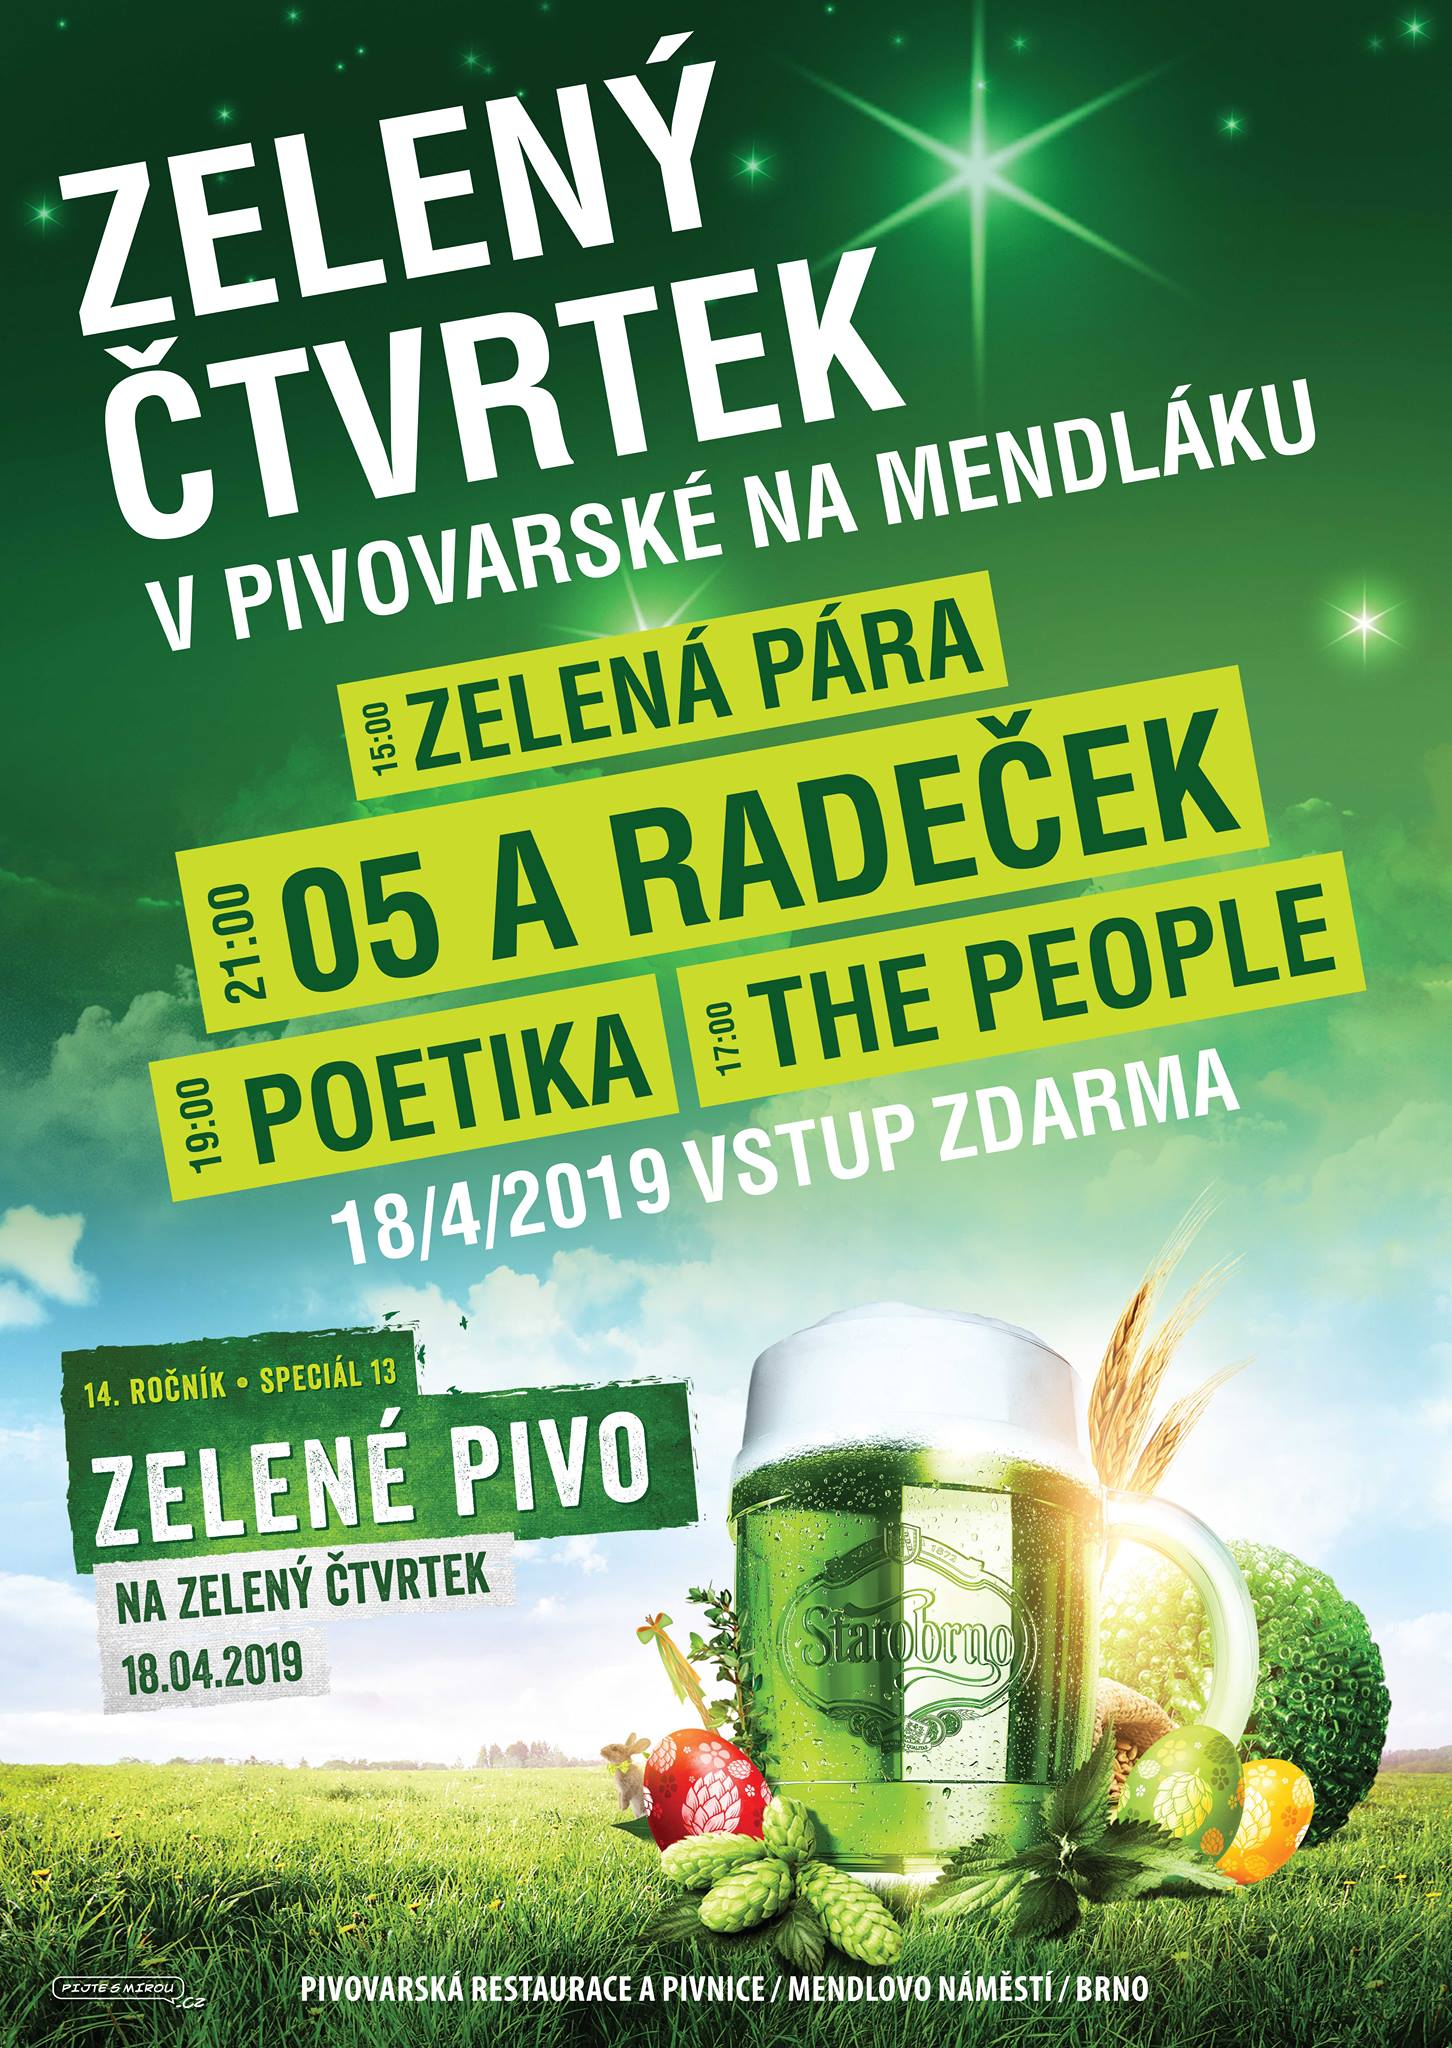 pivovari-pivovary-pivni-akce-zeleny-ctvrtek-v-pivovarske-na-mendlaku-2019